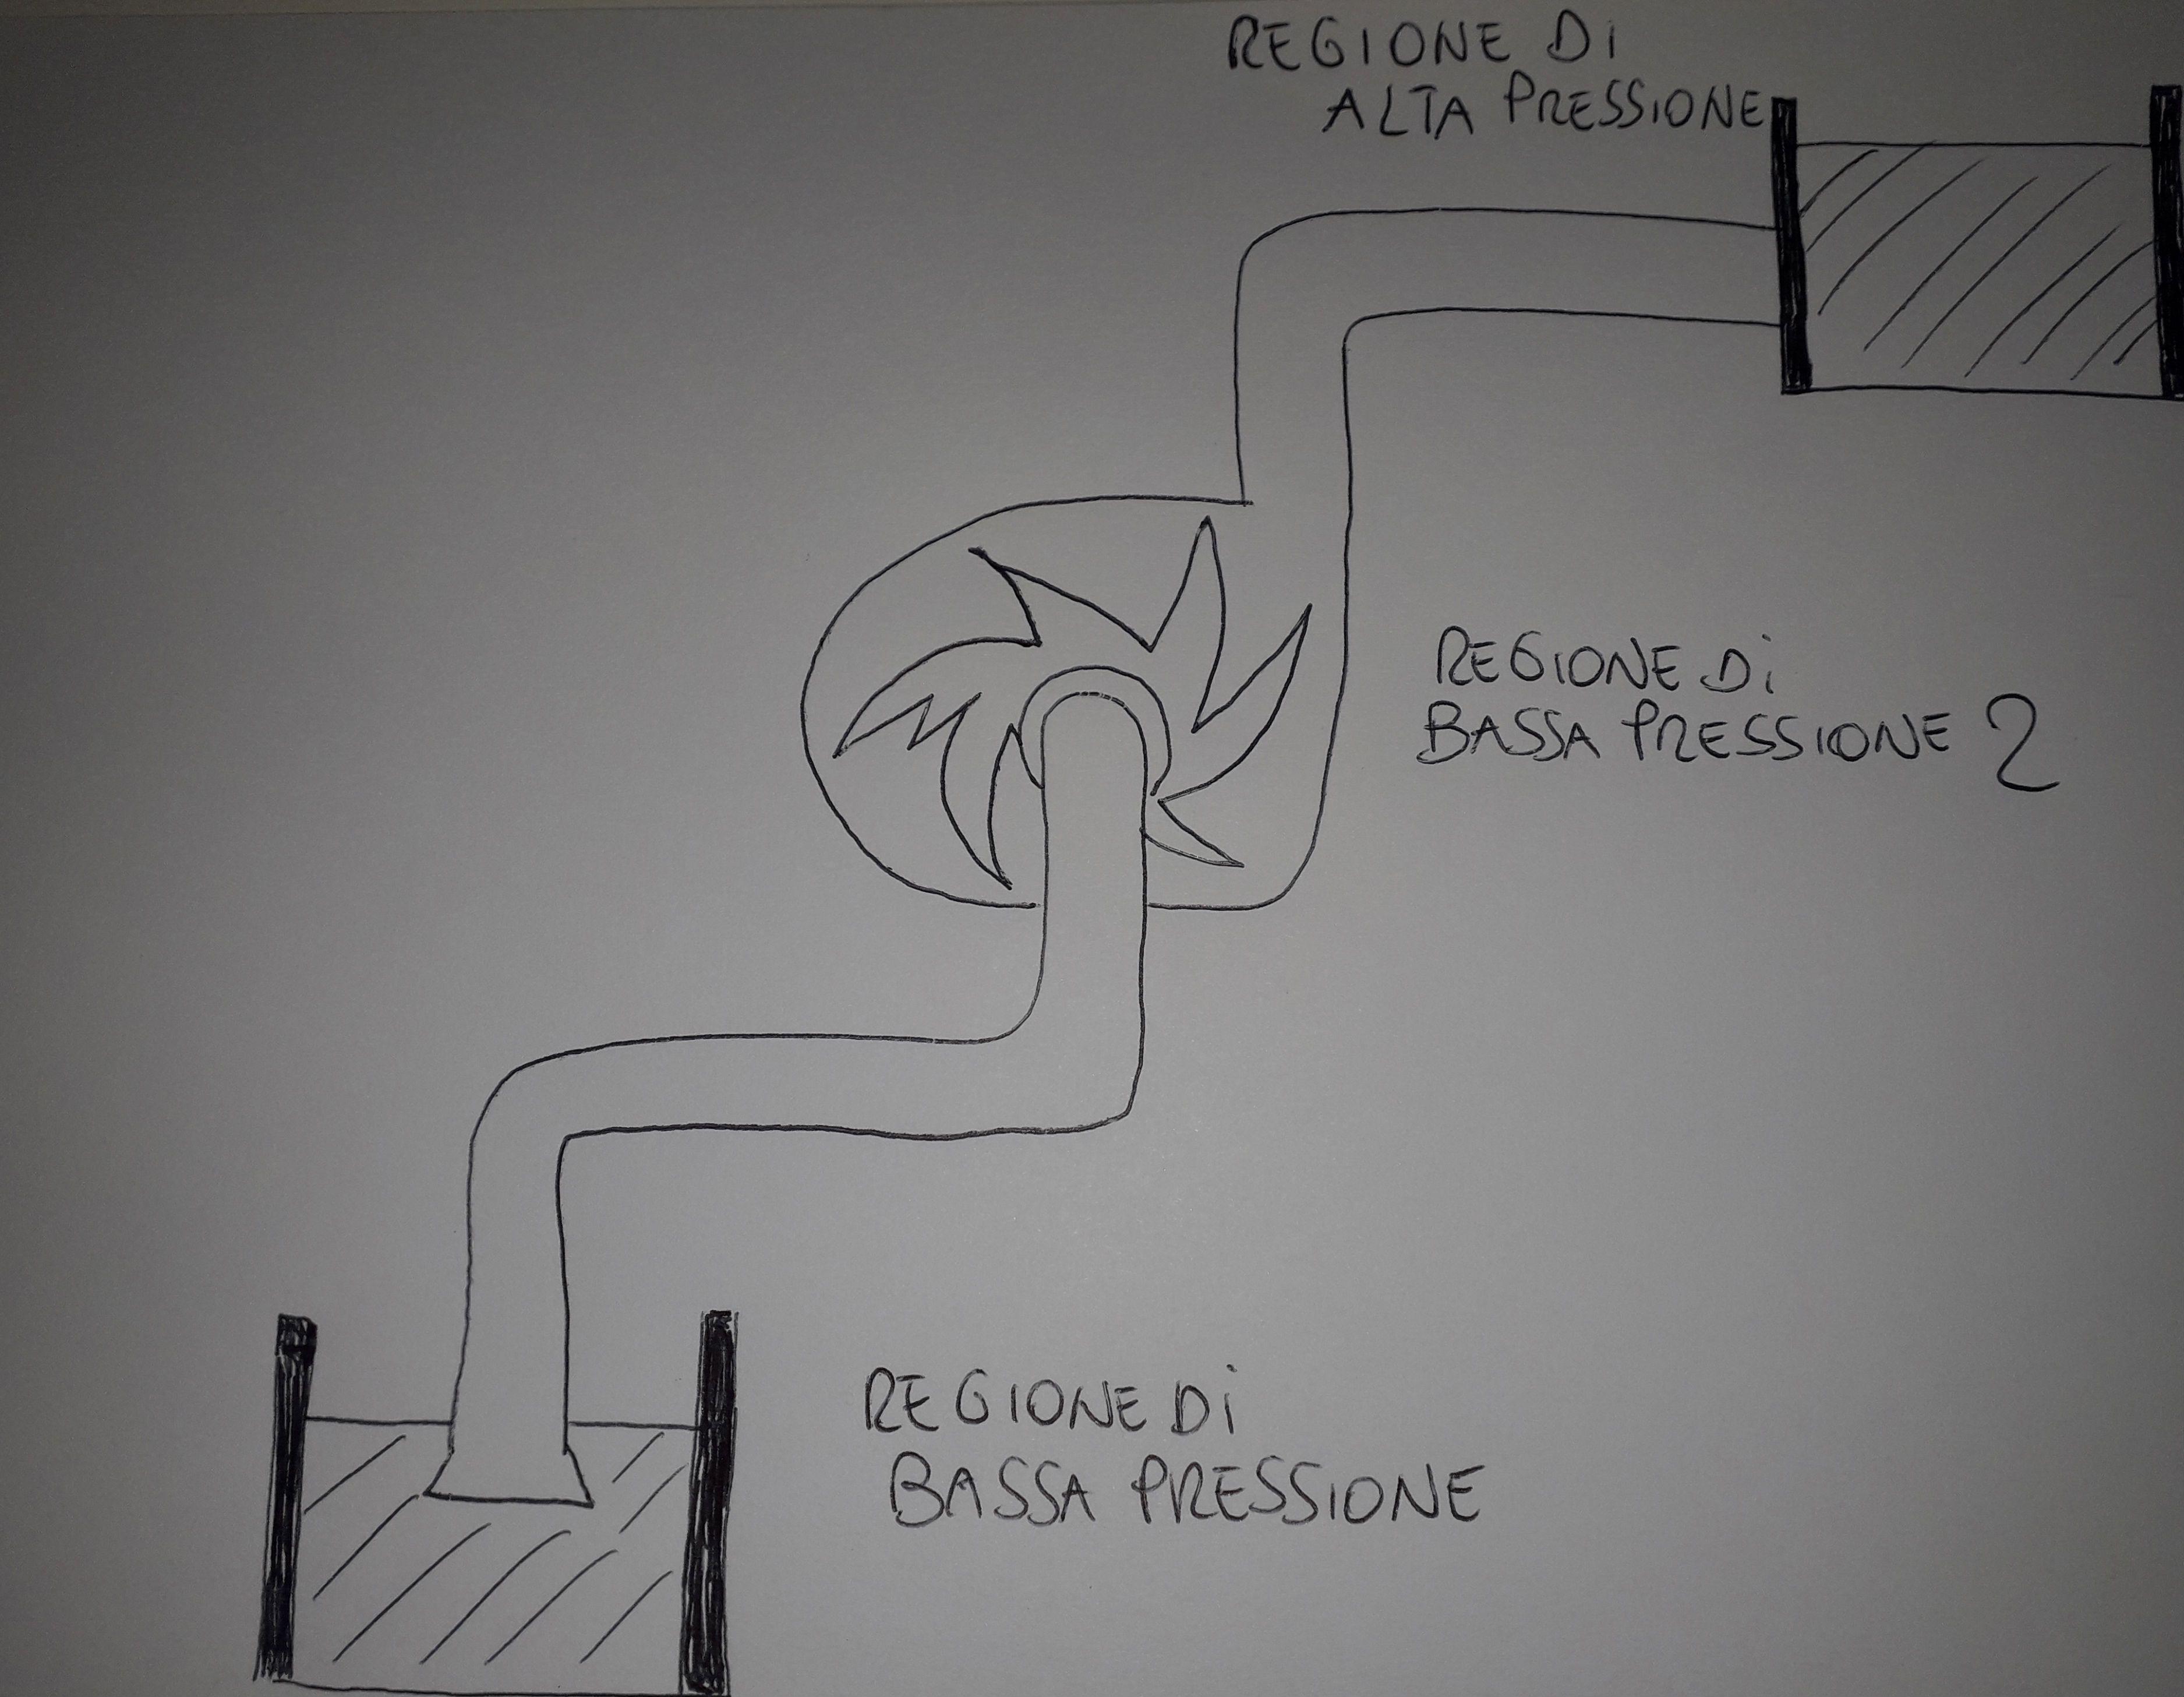 sollevamento acque pompa centrifuga